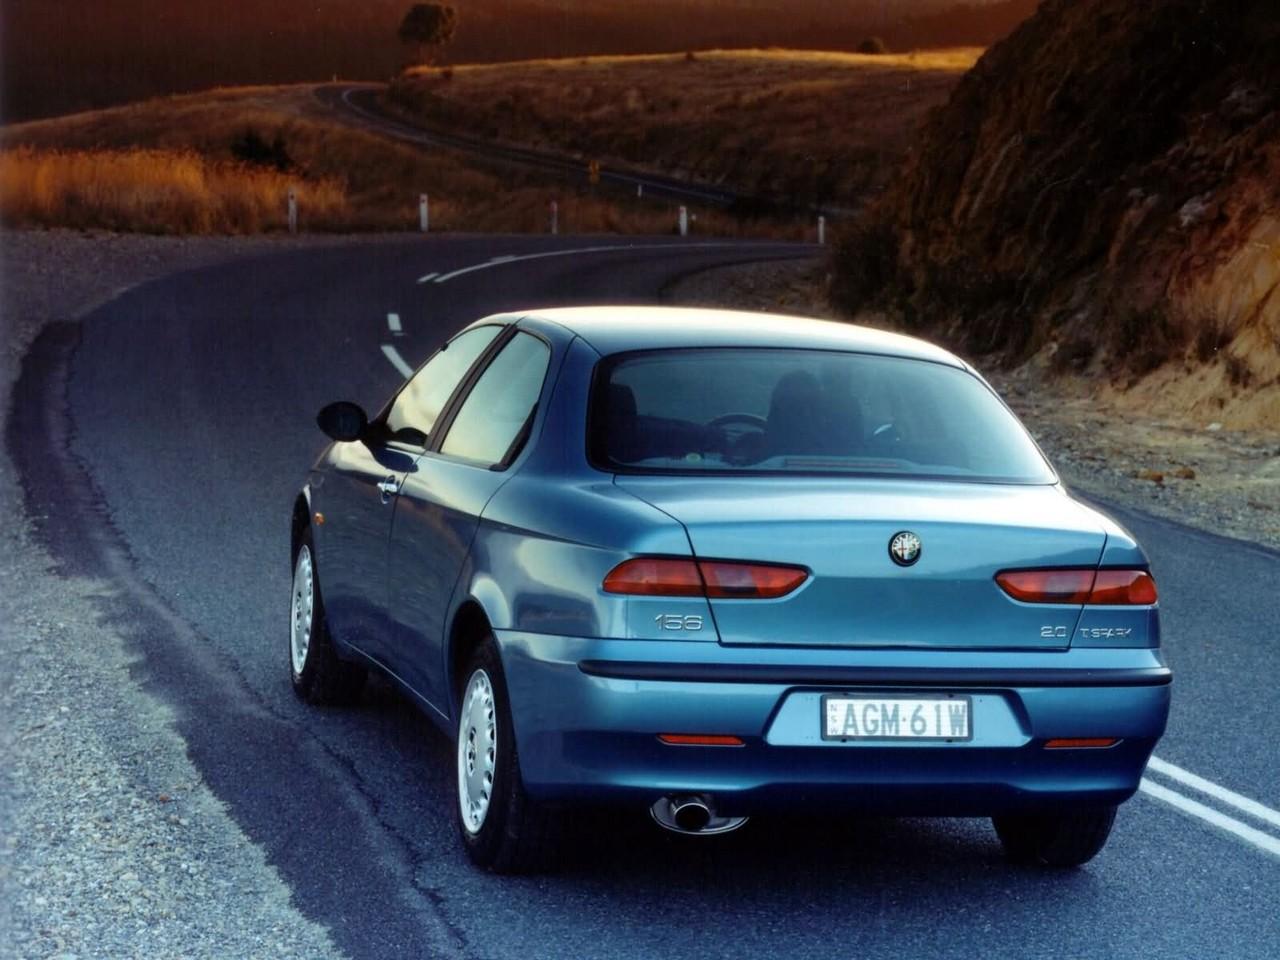 buyer s guide alfa romeo 156 sedan 1999 06 rh australiancar reviews alfa romeo 156 gta buyers guide Alfa Romeo 159